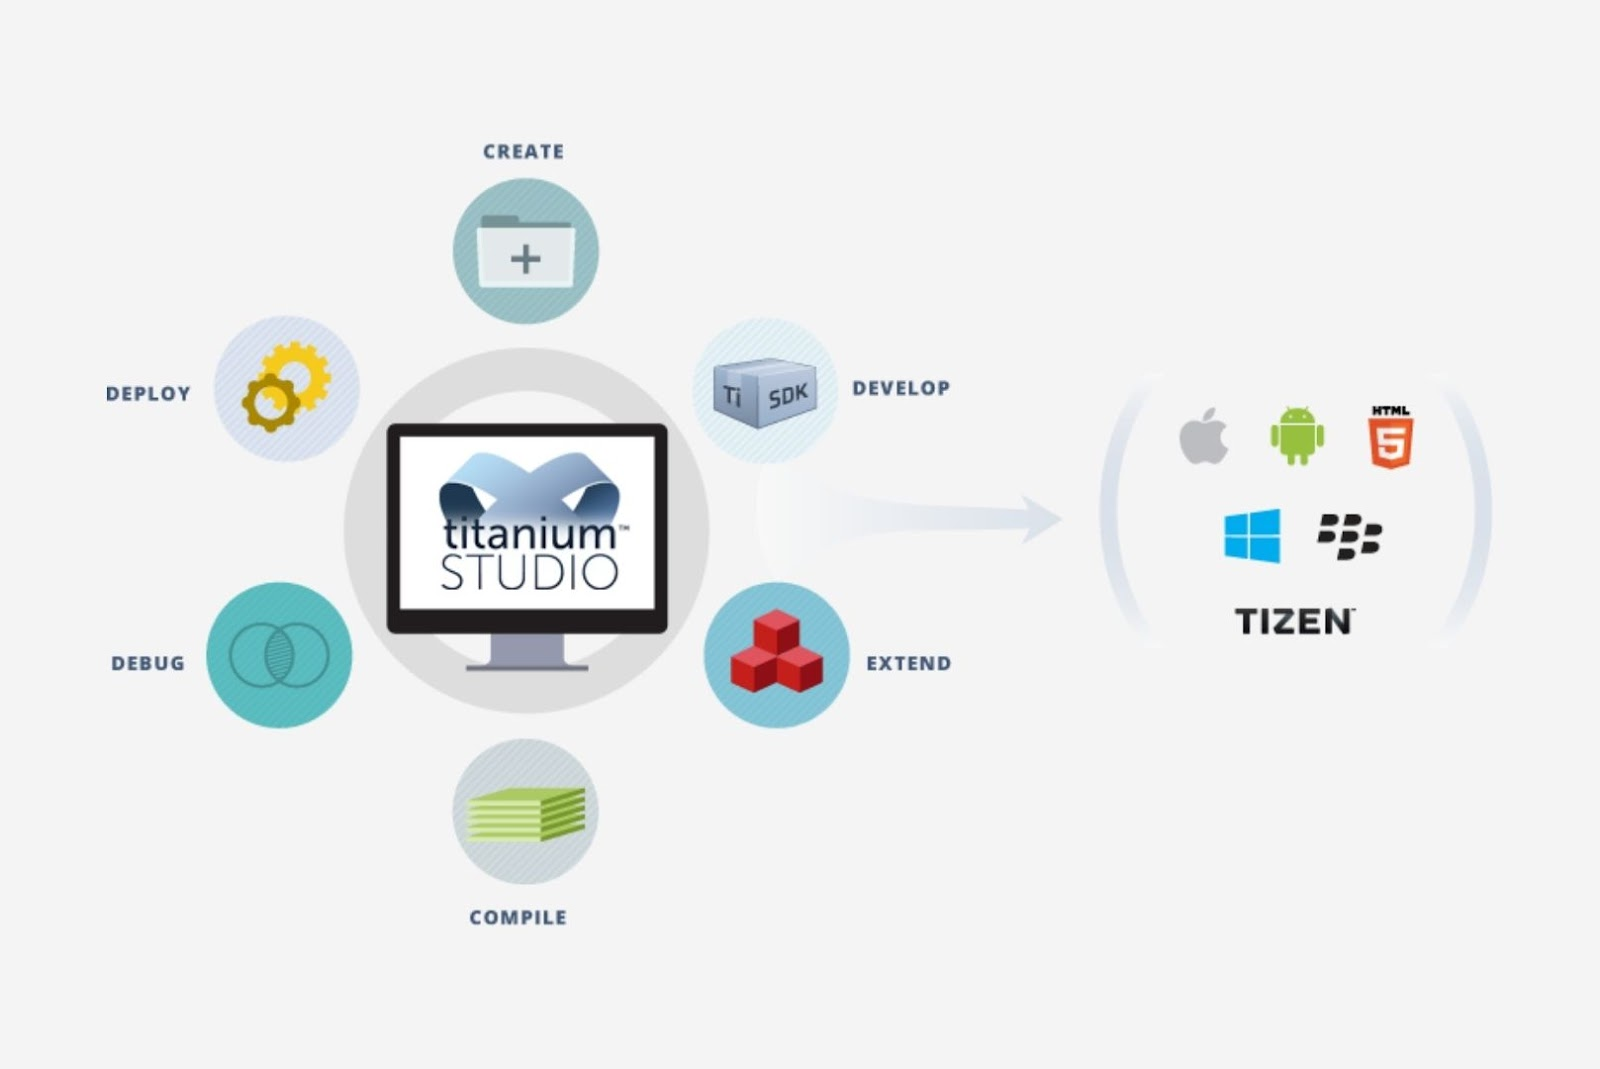 appcelerator Titanium cross-platform app development